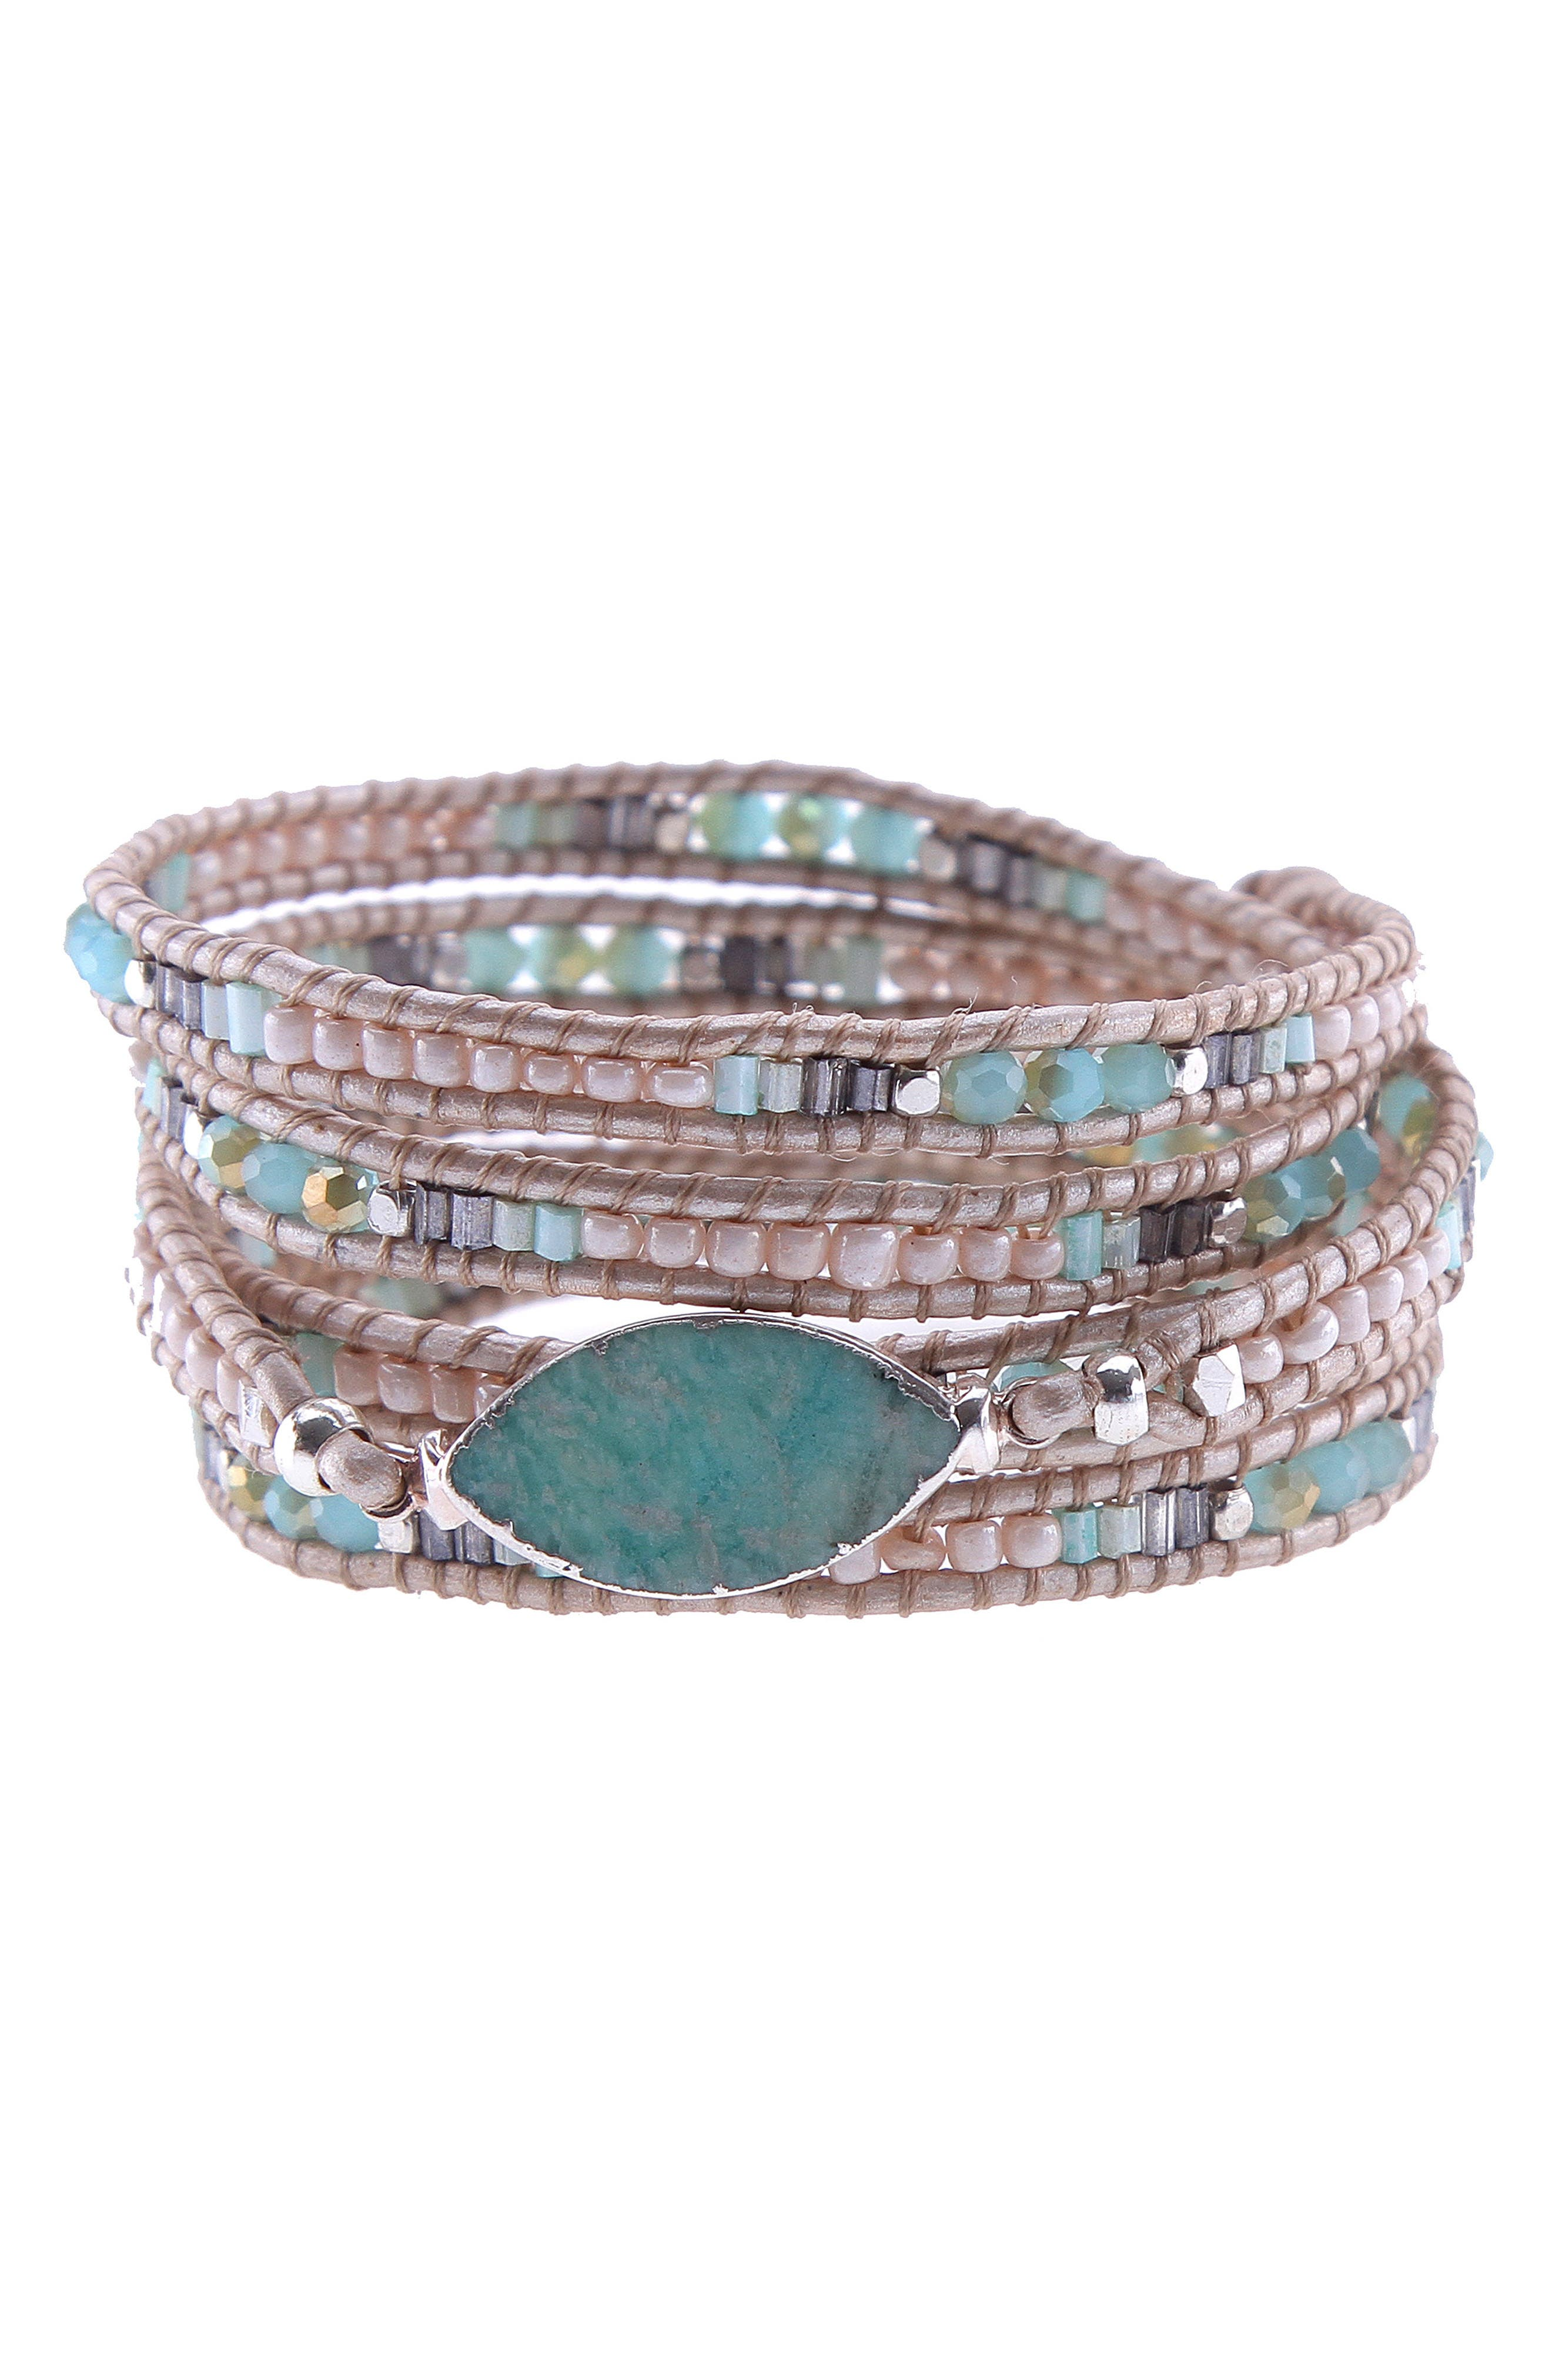 Beaded Agate Wrap Bracelet,                             Main thumbnail 1, color,                             Aqua